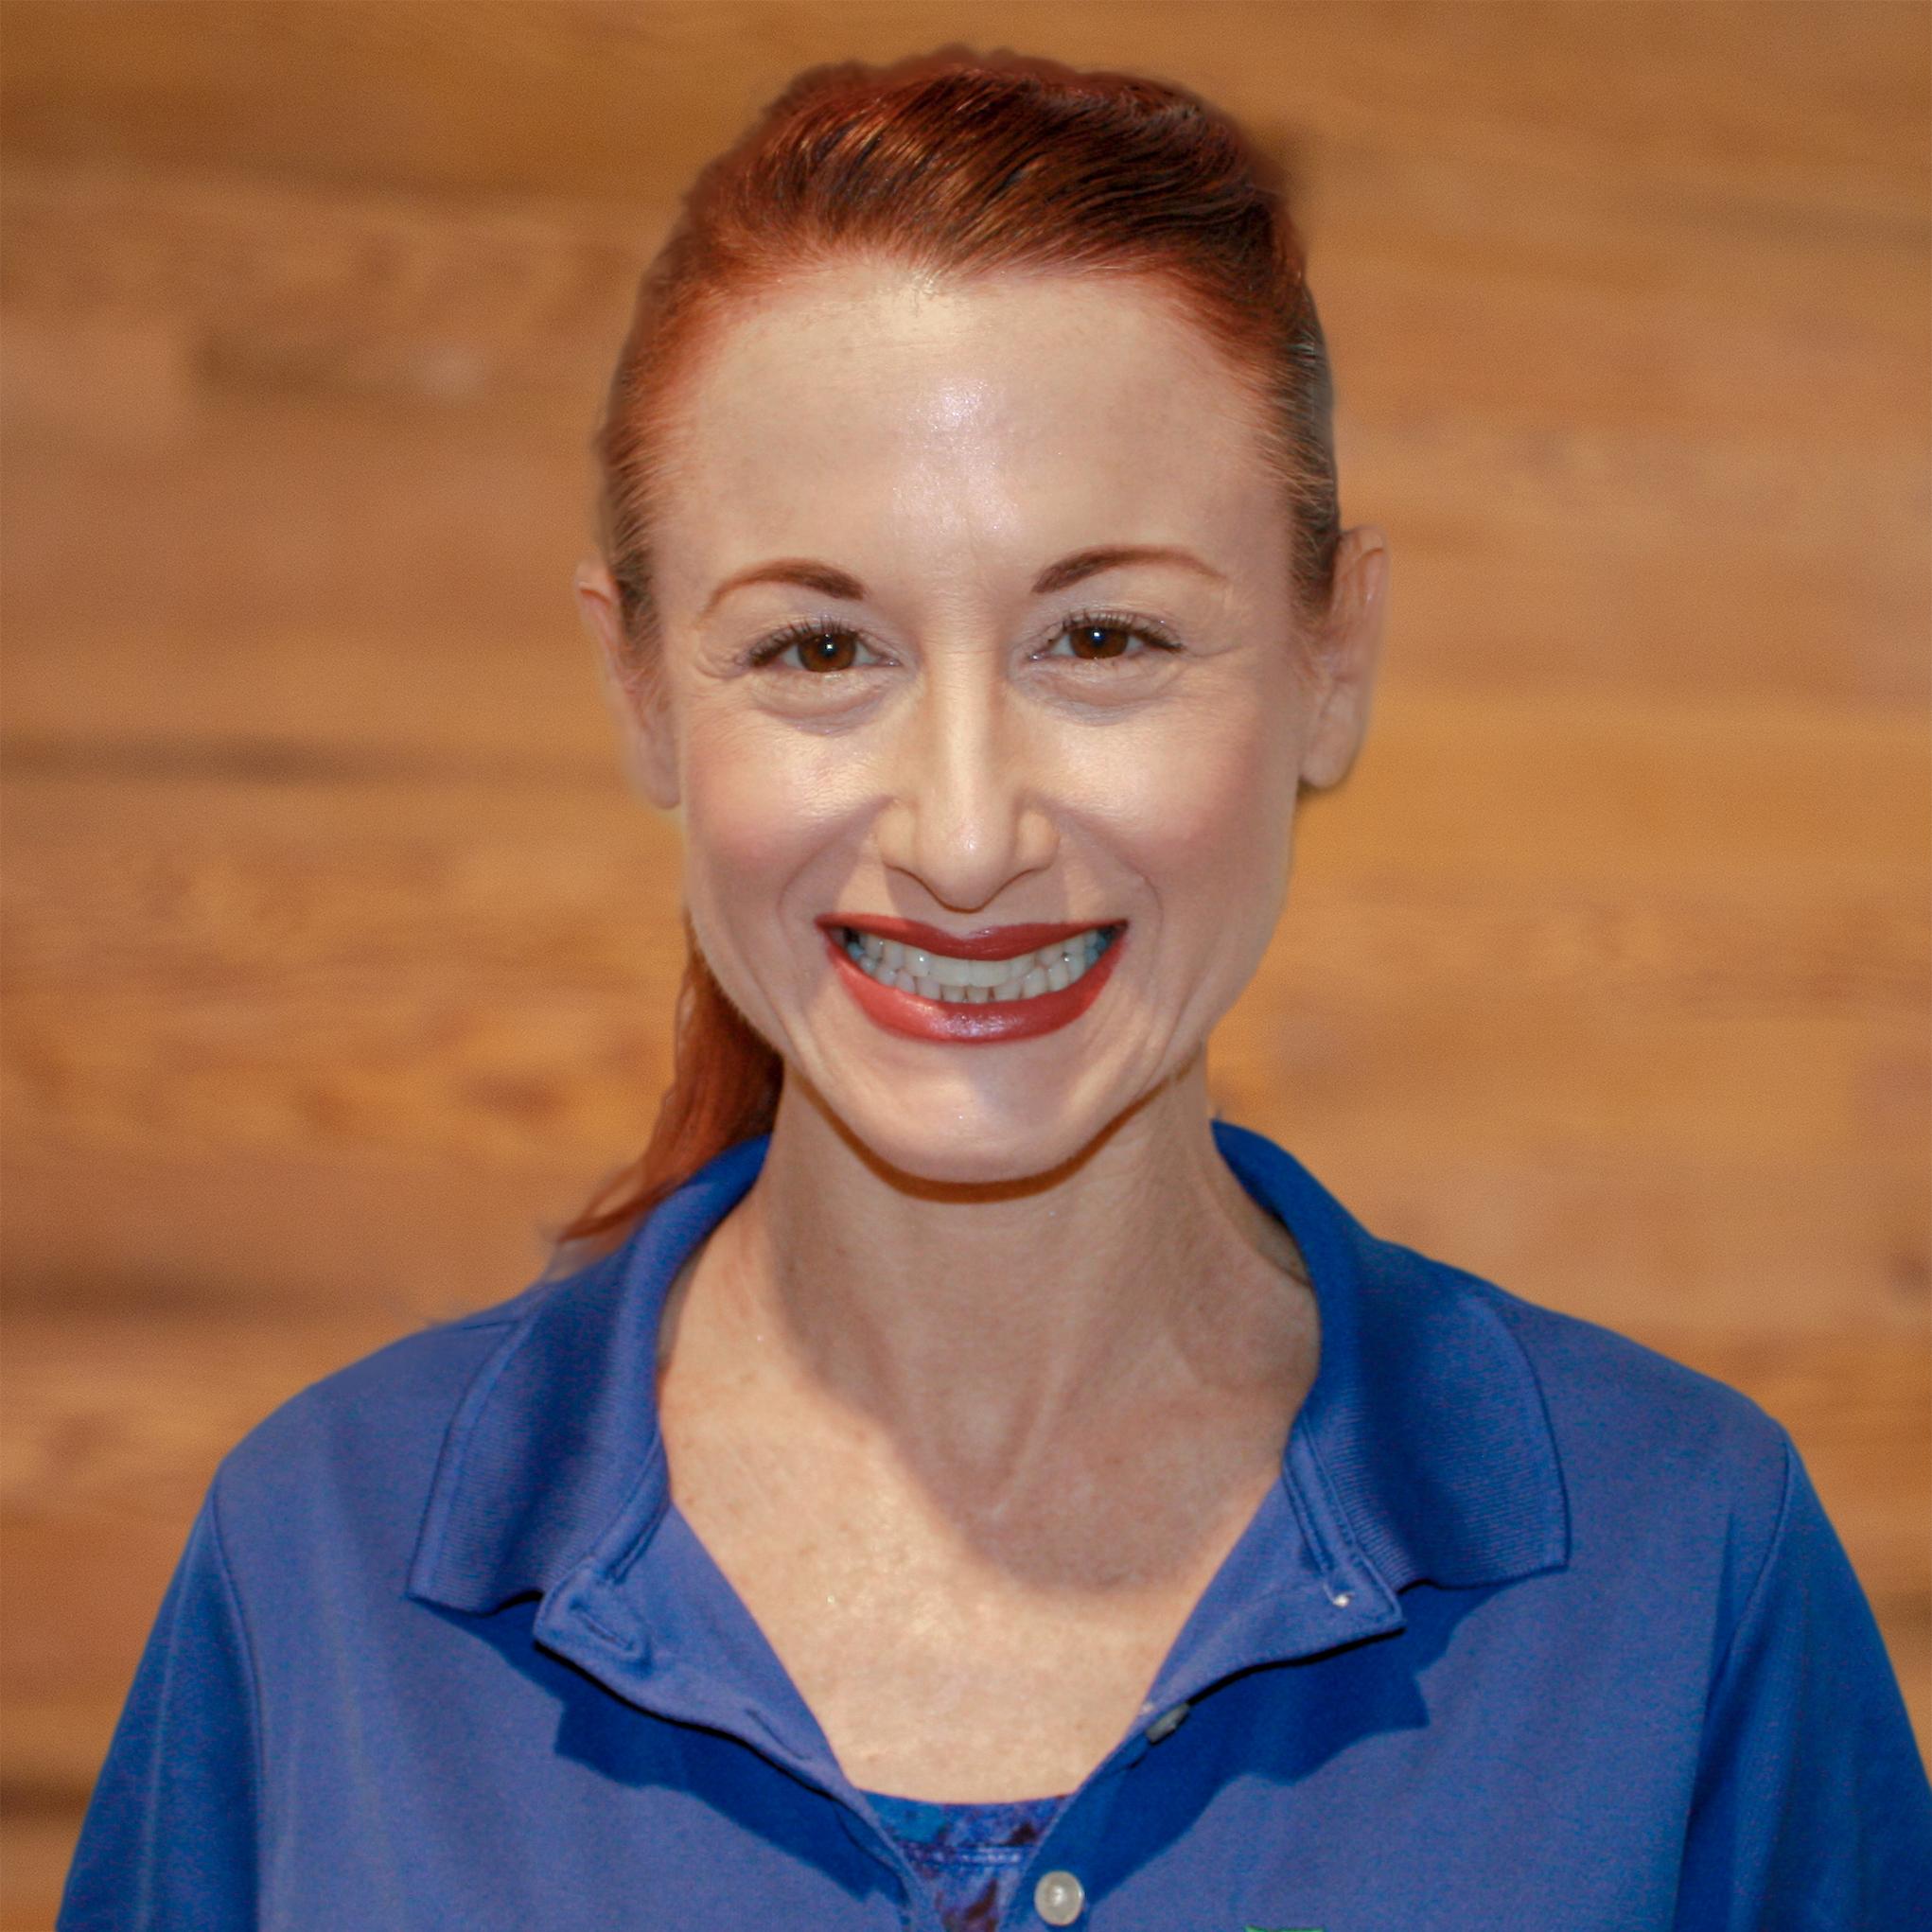 Lori Ann Lapidos, PTA - Orthopedics & SportsWellness & Prevention